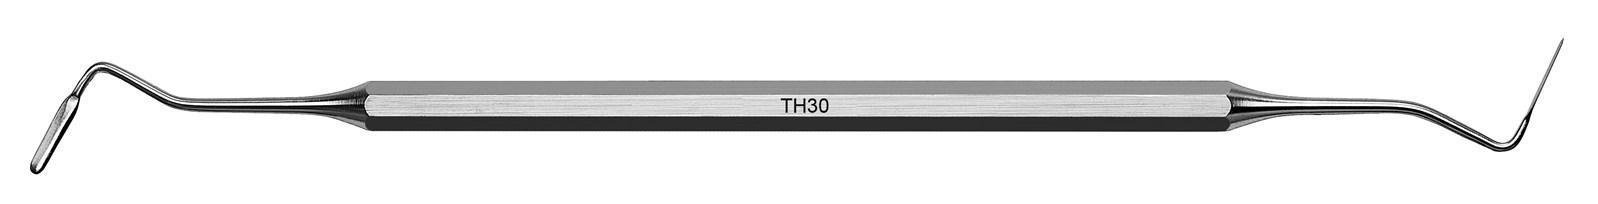 Periotom - TH30, ADEP světle modrý